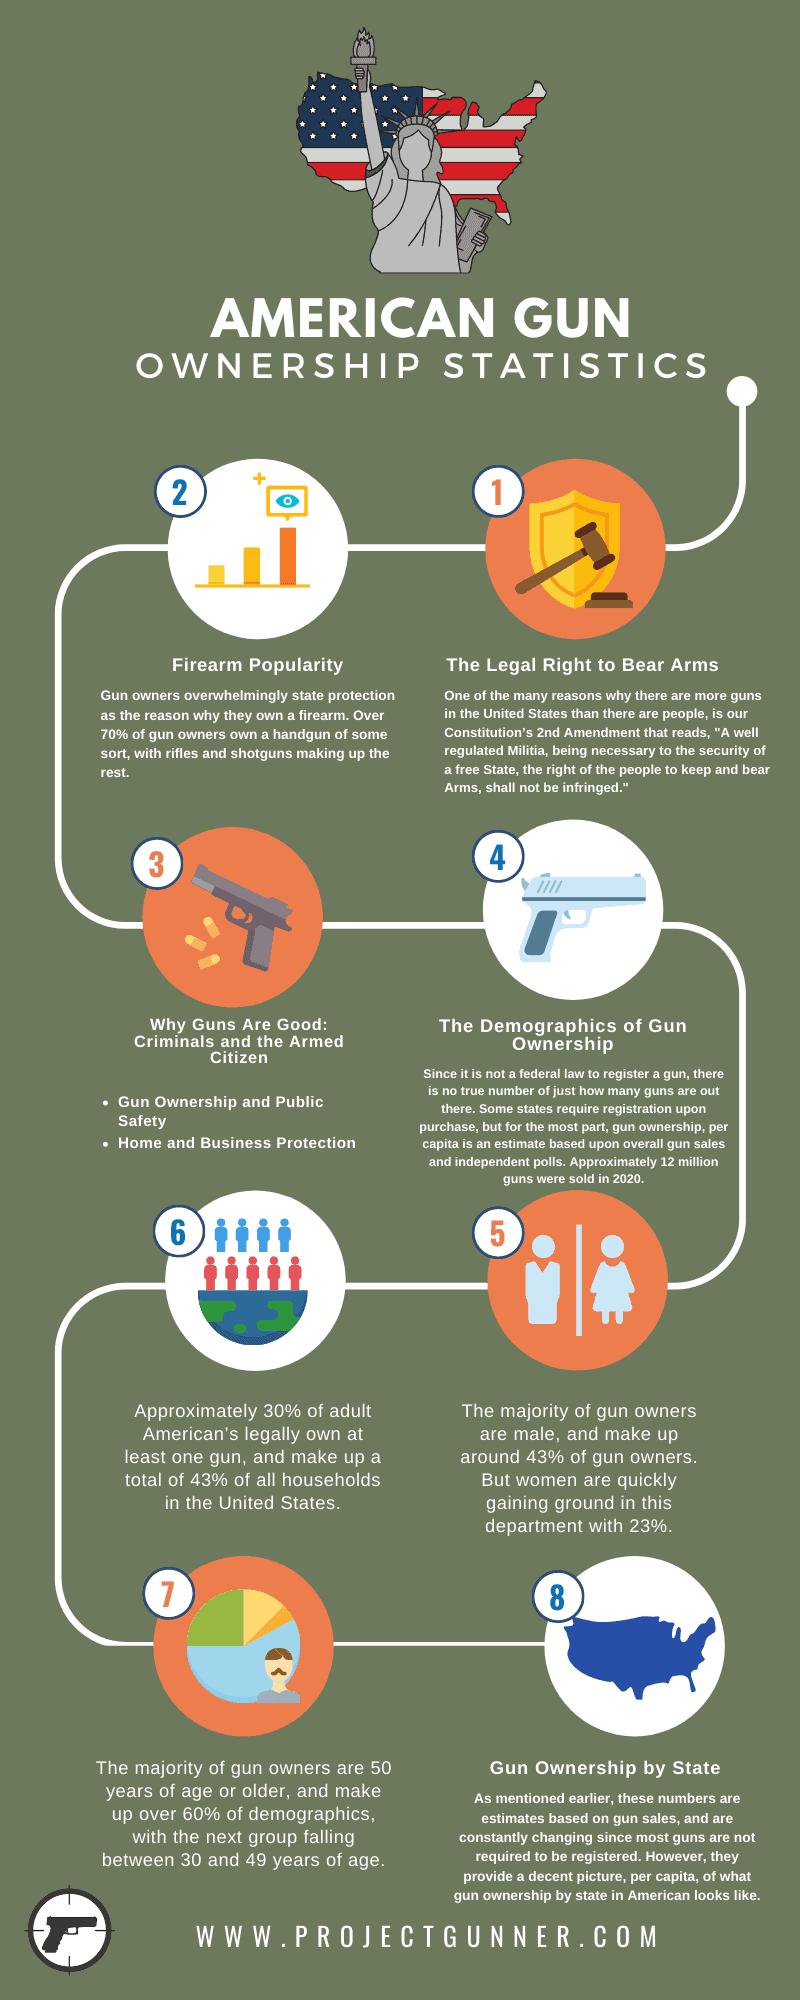 American Gun Ownership Statistics - Infographic